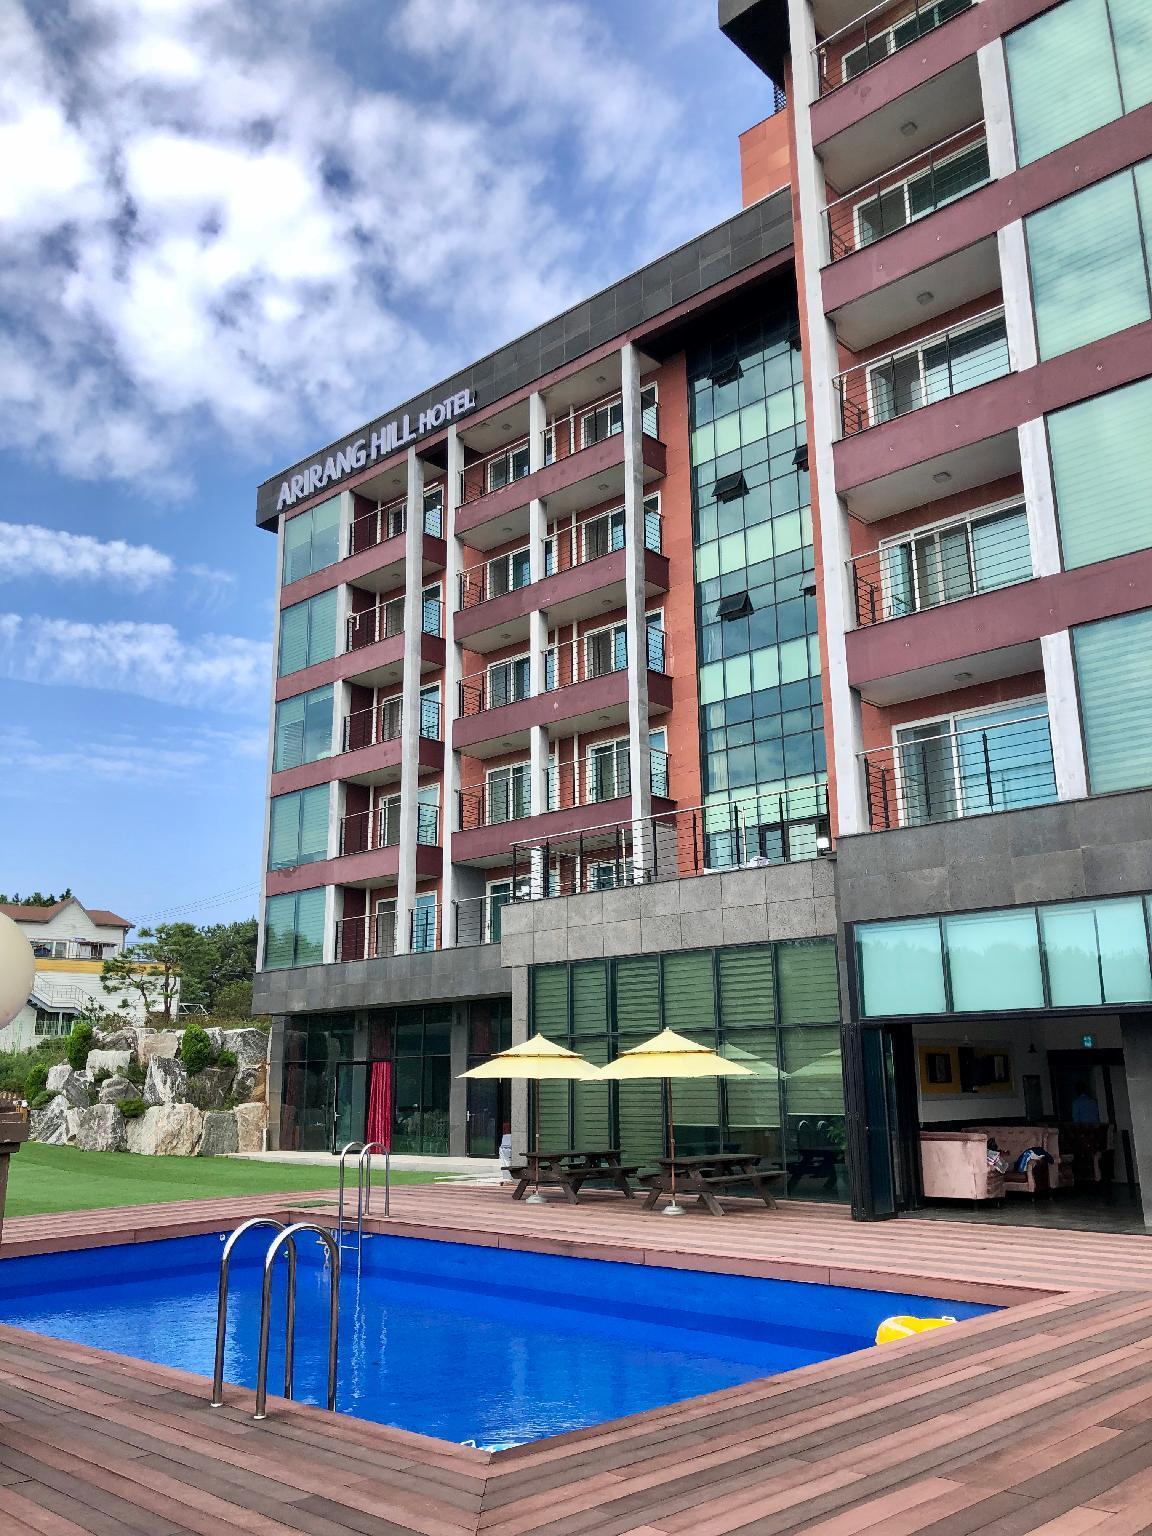 Arirang Hill Hotel And Resort